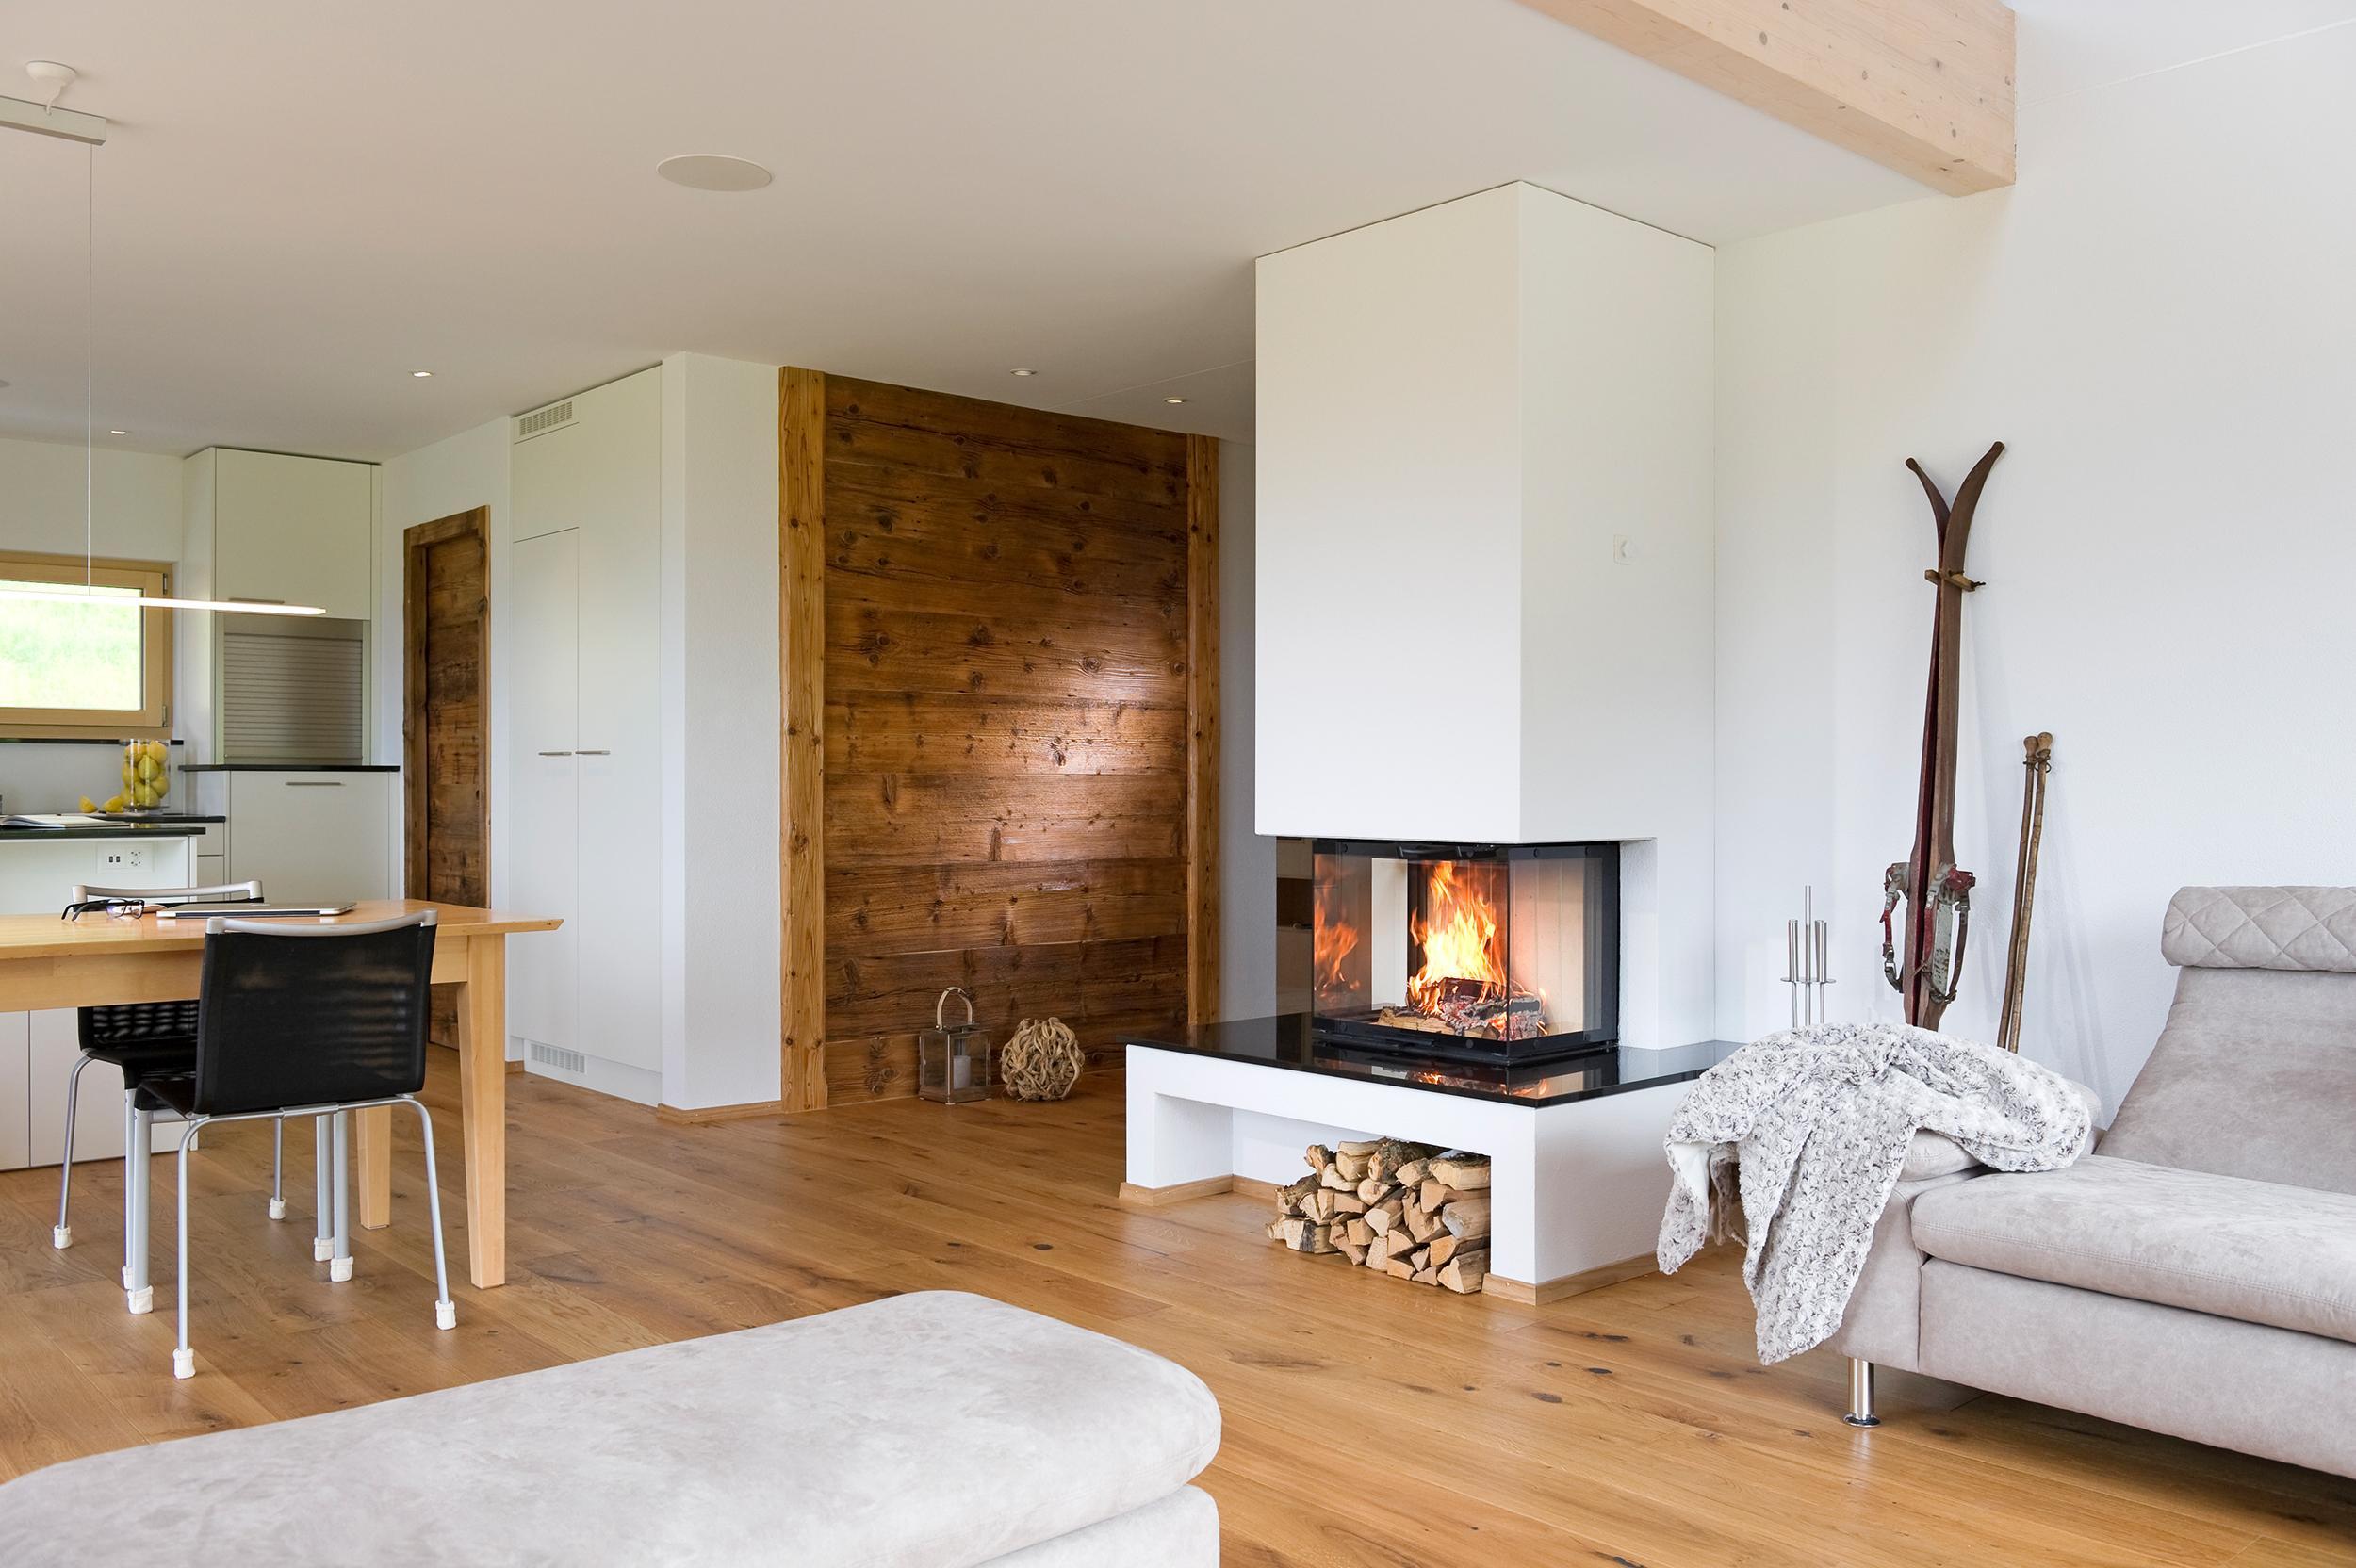 kachelofen bilder ideen couchstyle. Black Bedroom Furniture Sets. Home Design Ideas